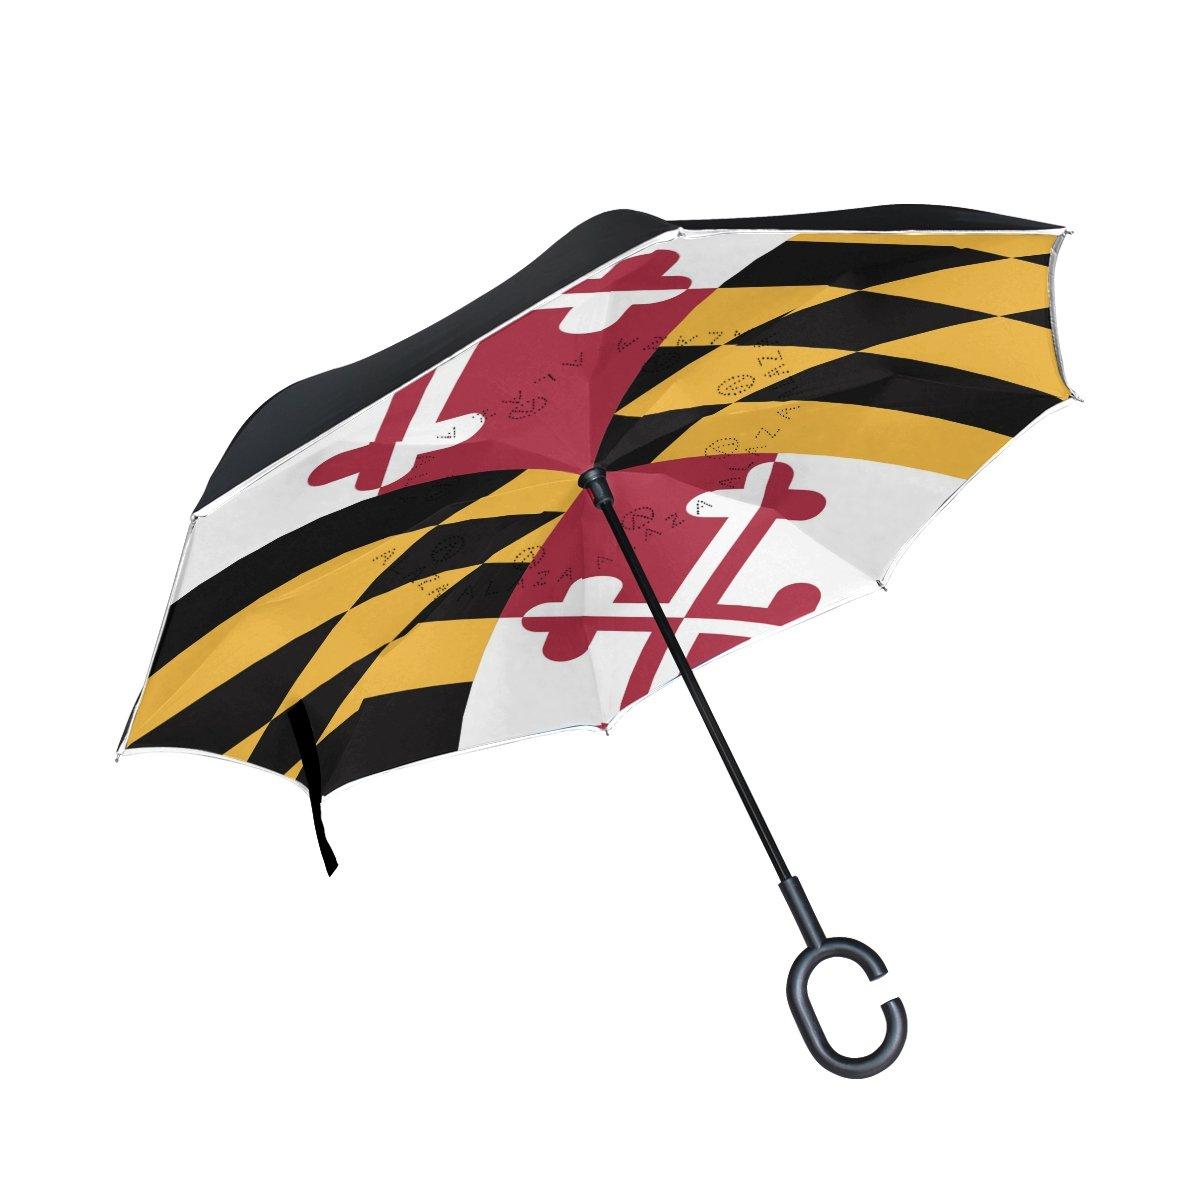 CHLBOJ Double Layer Inverted Umbrella Cars Reverse Umbrella Maryland Flag Windproof UV Proof Travel Outdoor Umbrella